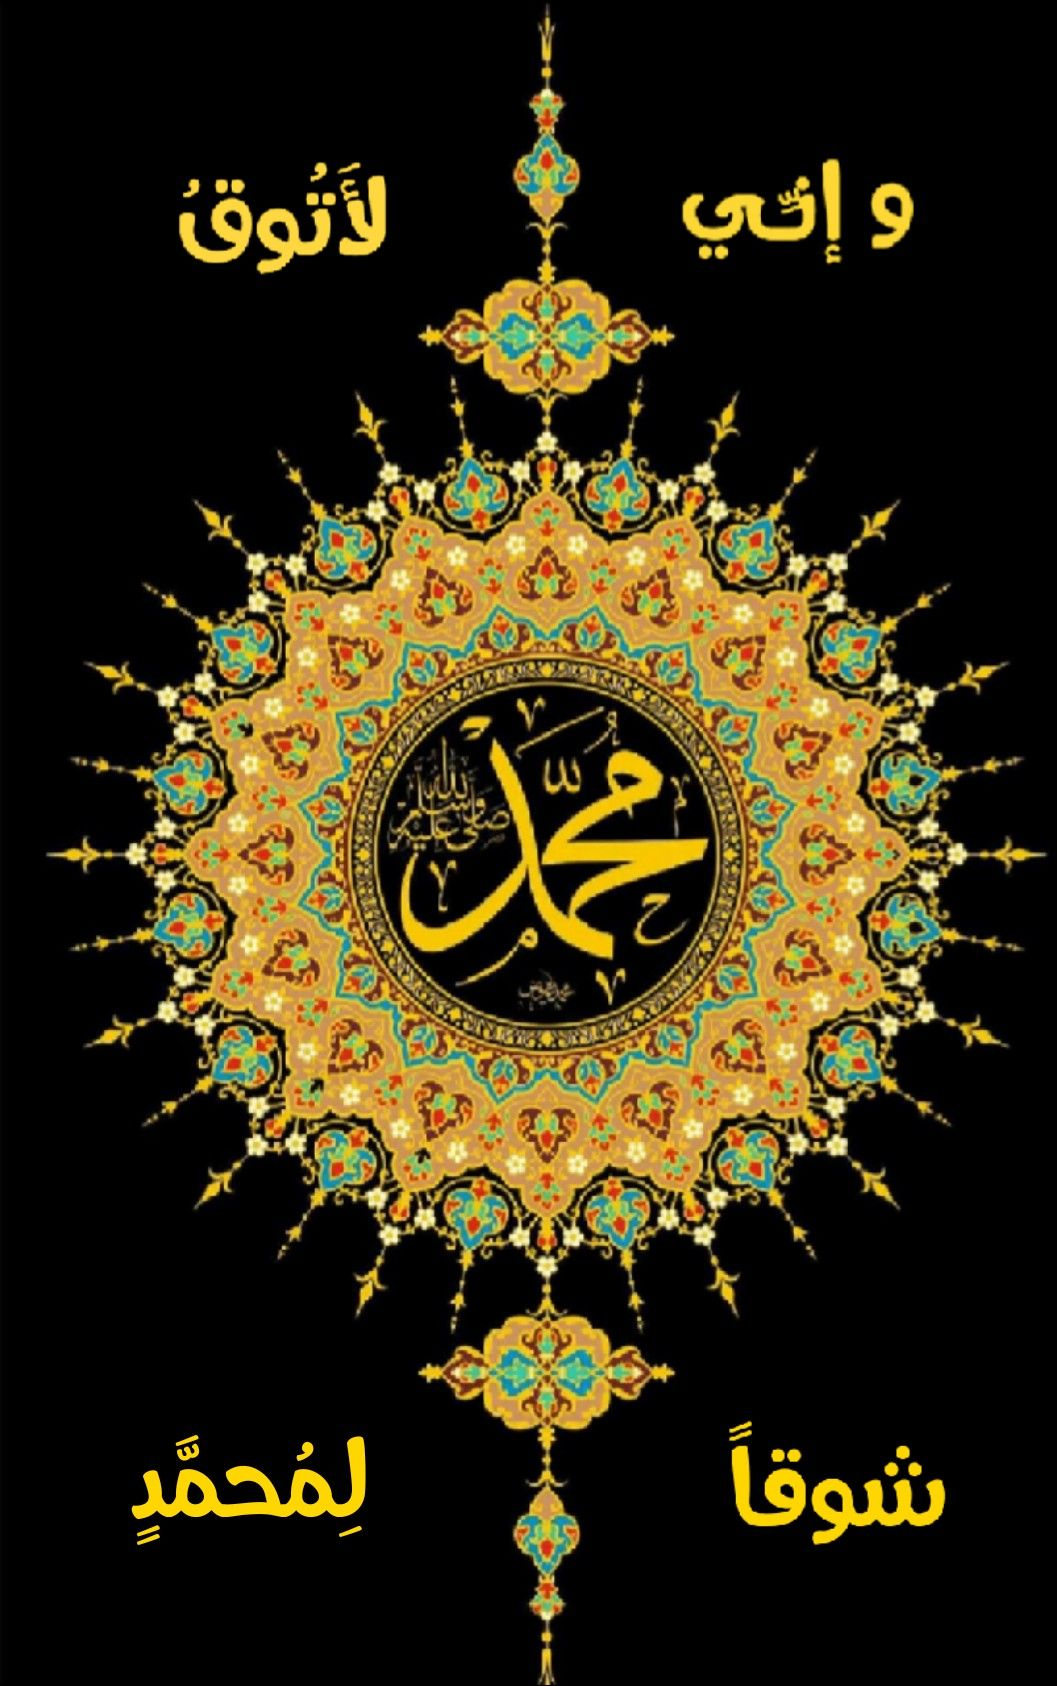 Pin By Muhammed Basha On محمد صلى الله عليه و سلم Islamic Art Calligraphy Islamic Calligraphy Painting Islamic Caligraphy Art